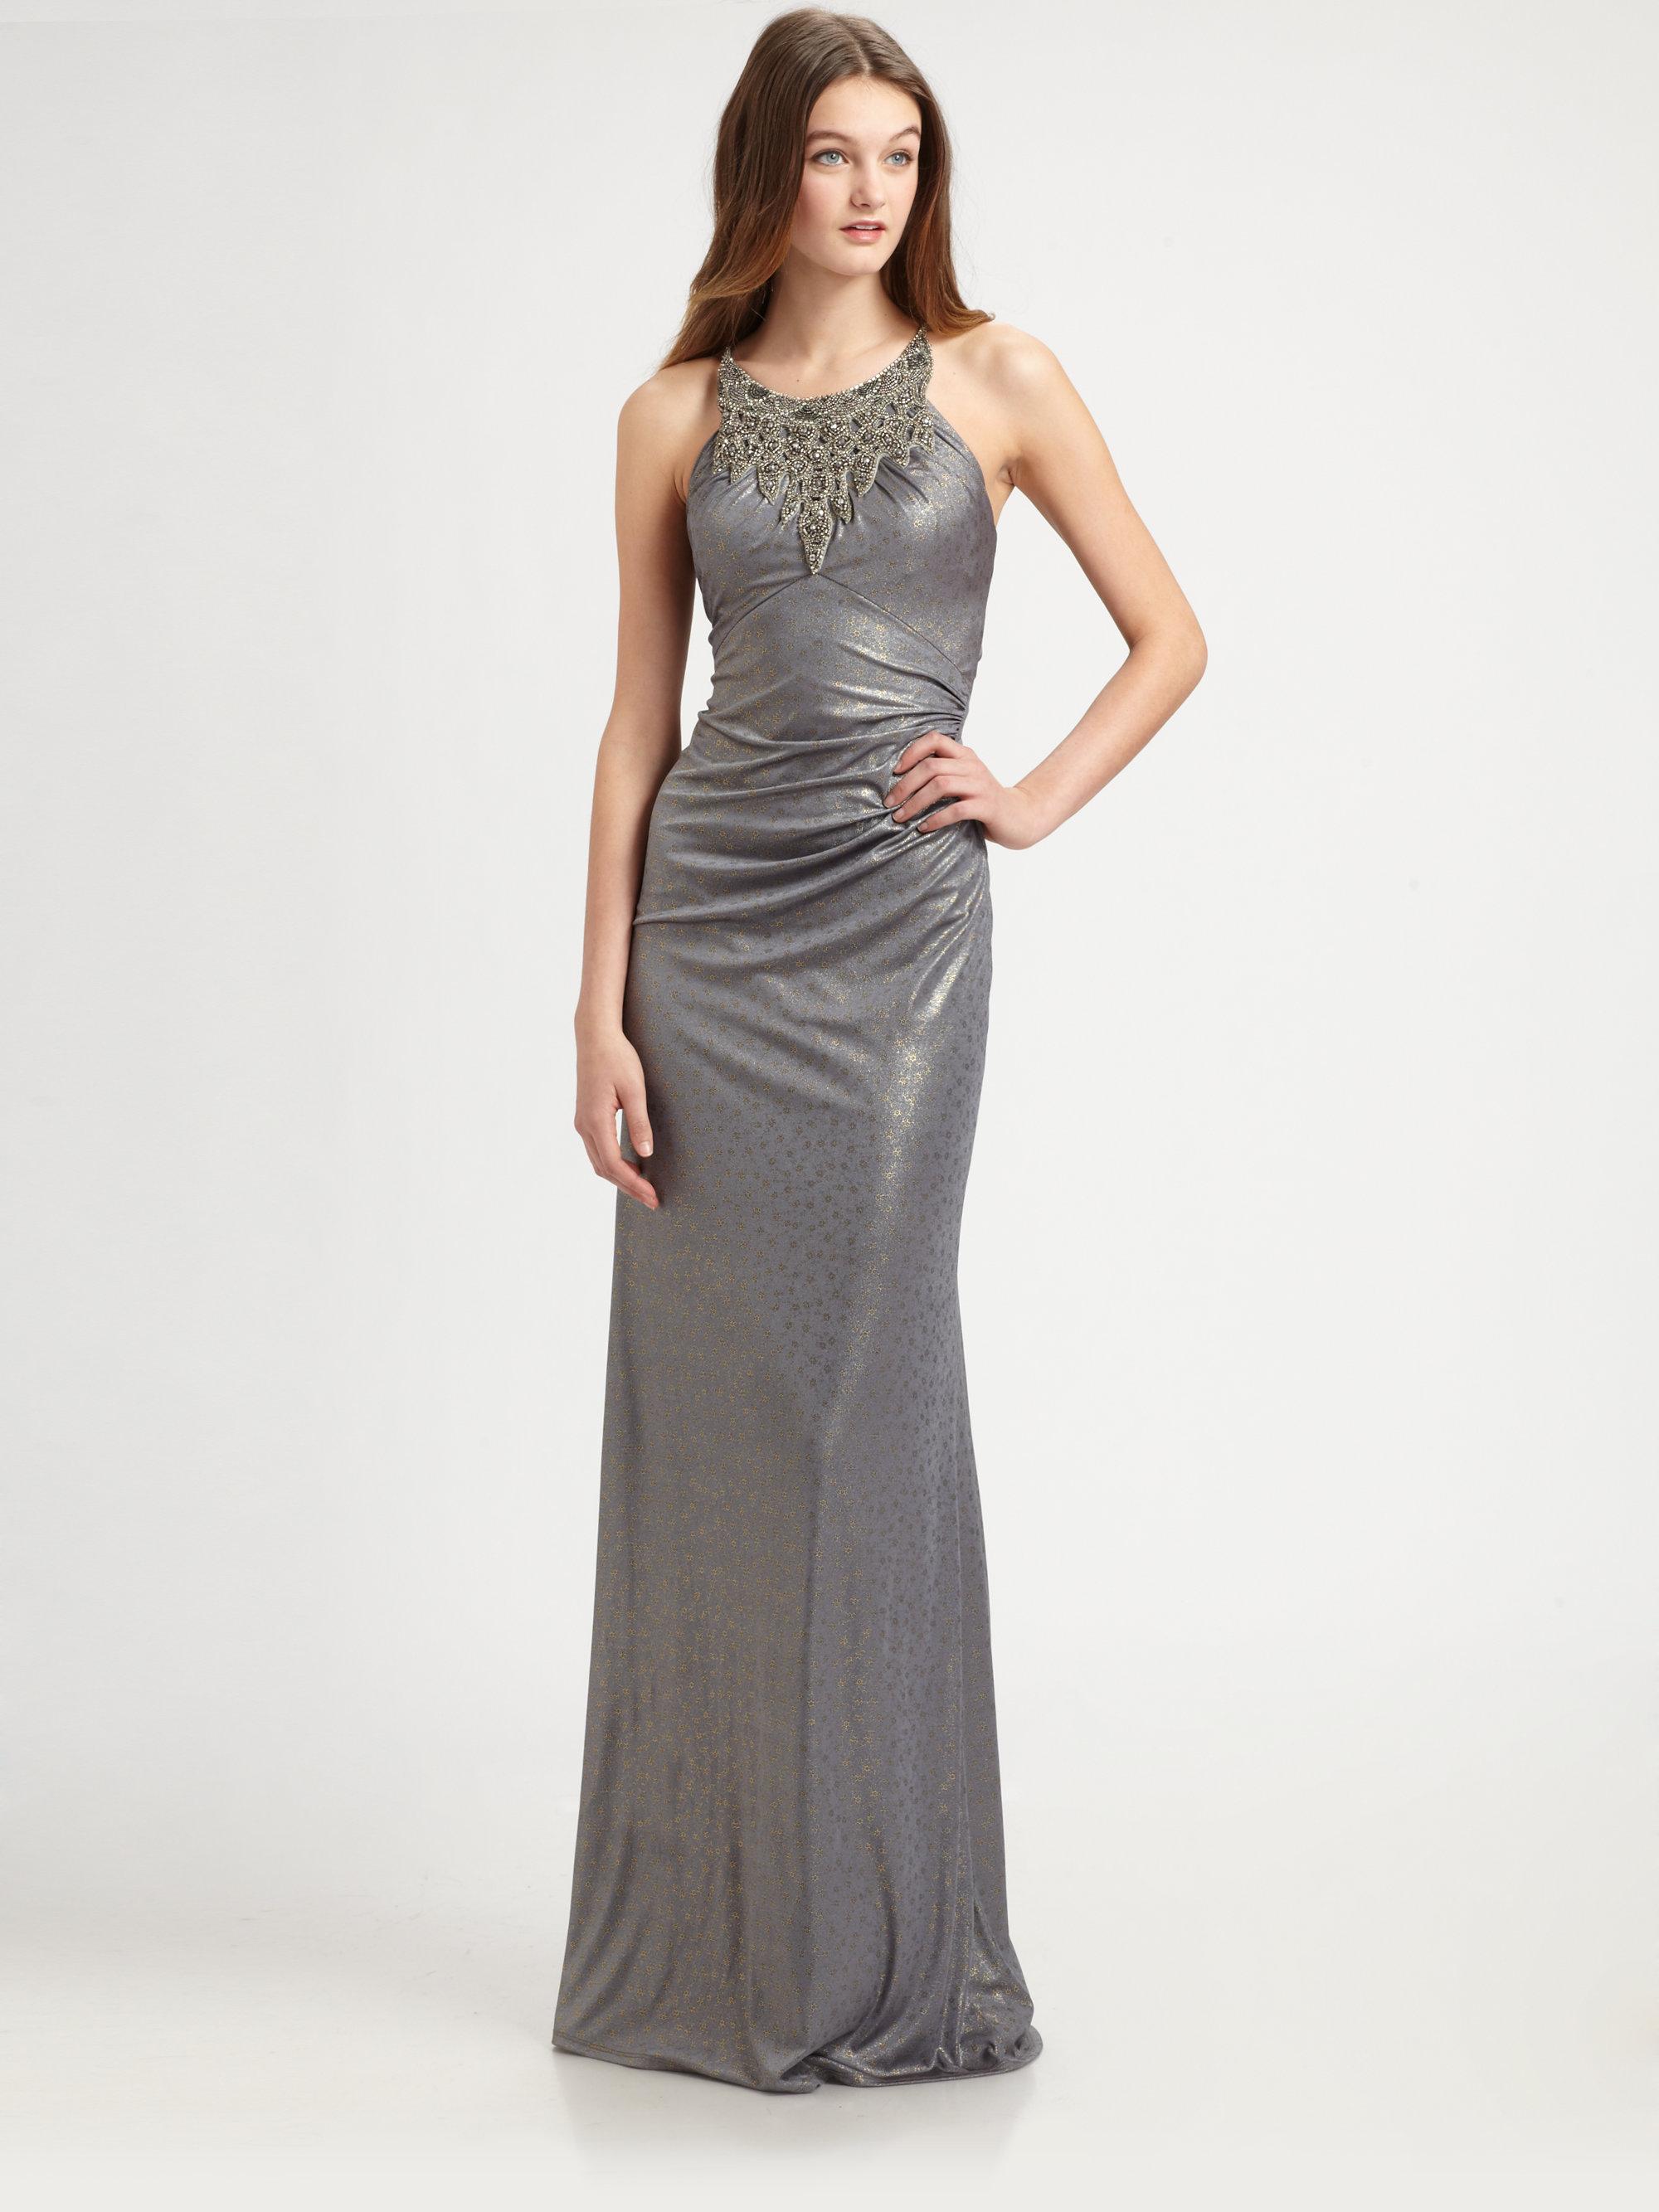 Lyst - David Meister Metallic Gown in Metallic